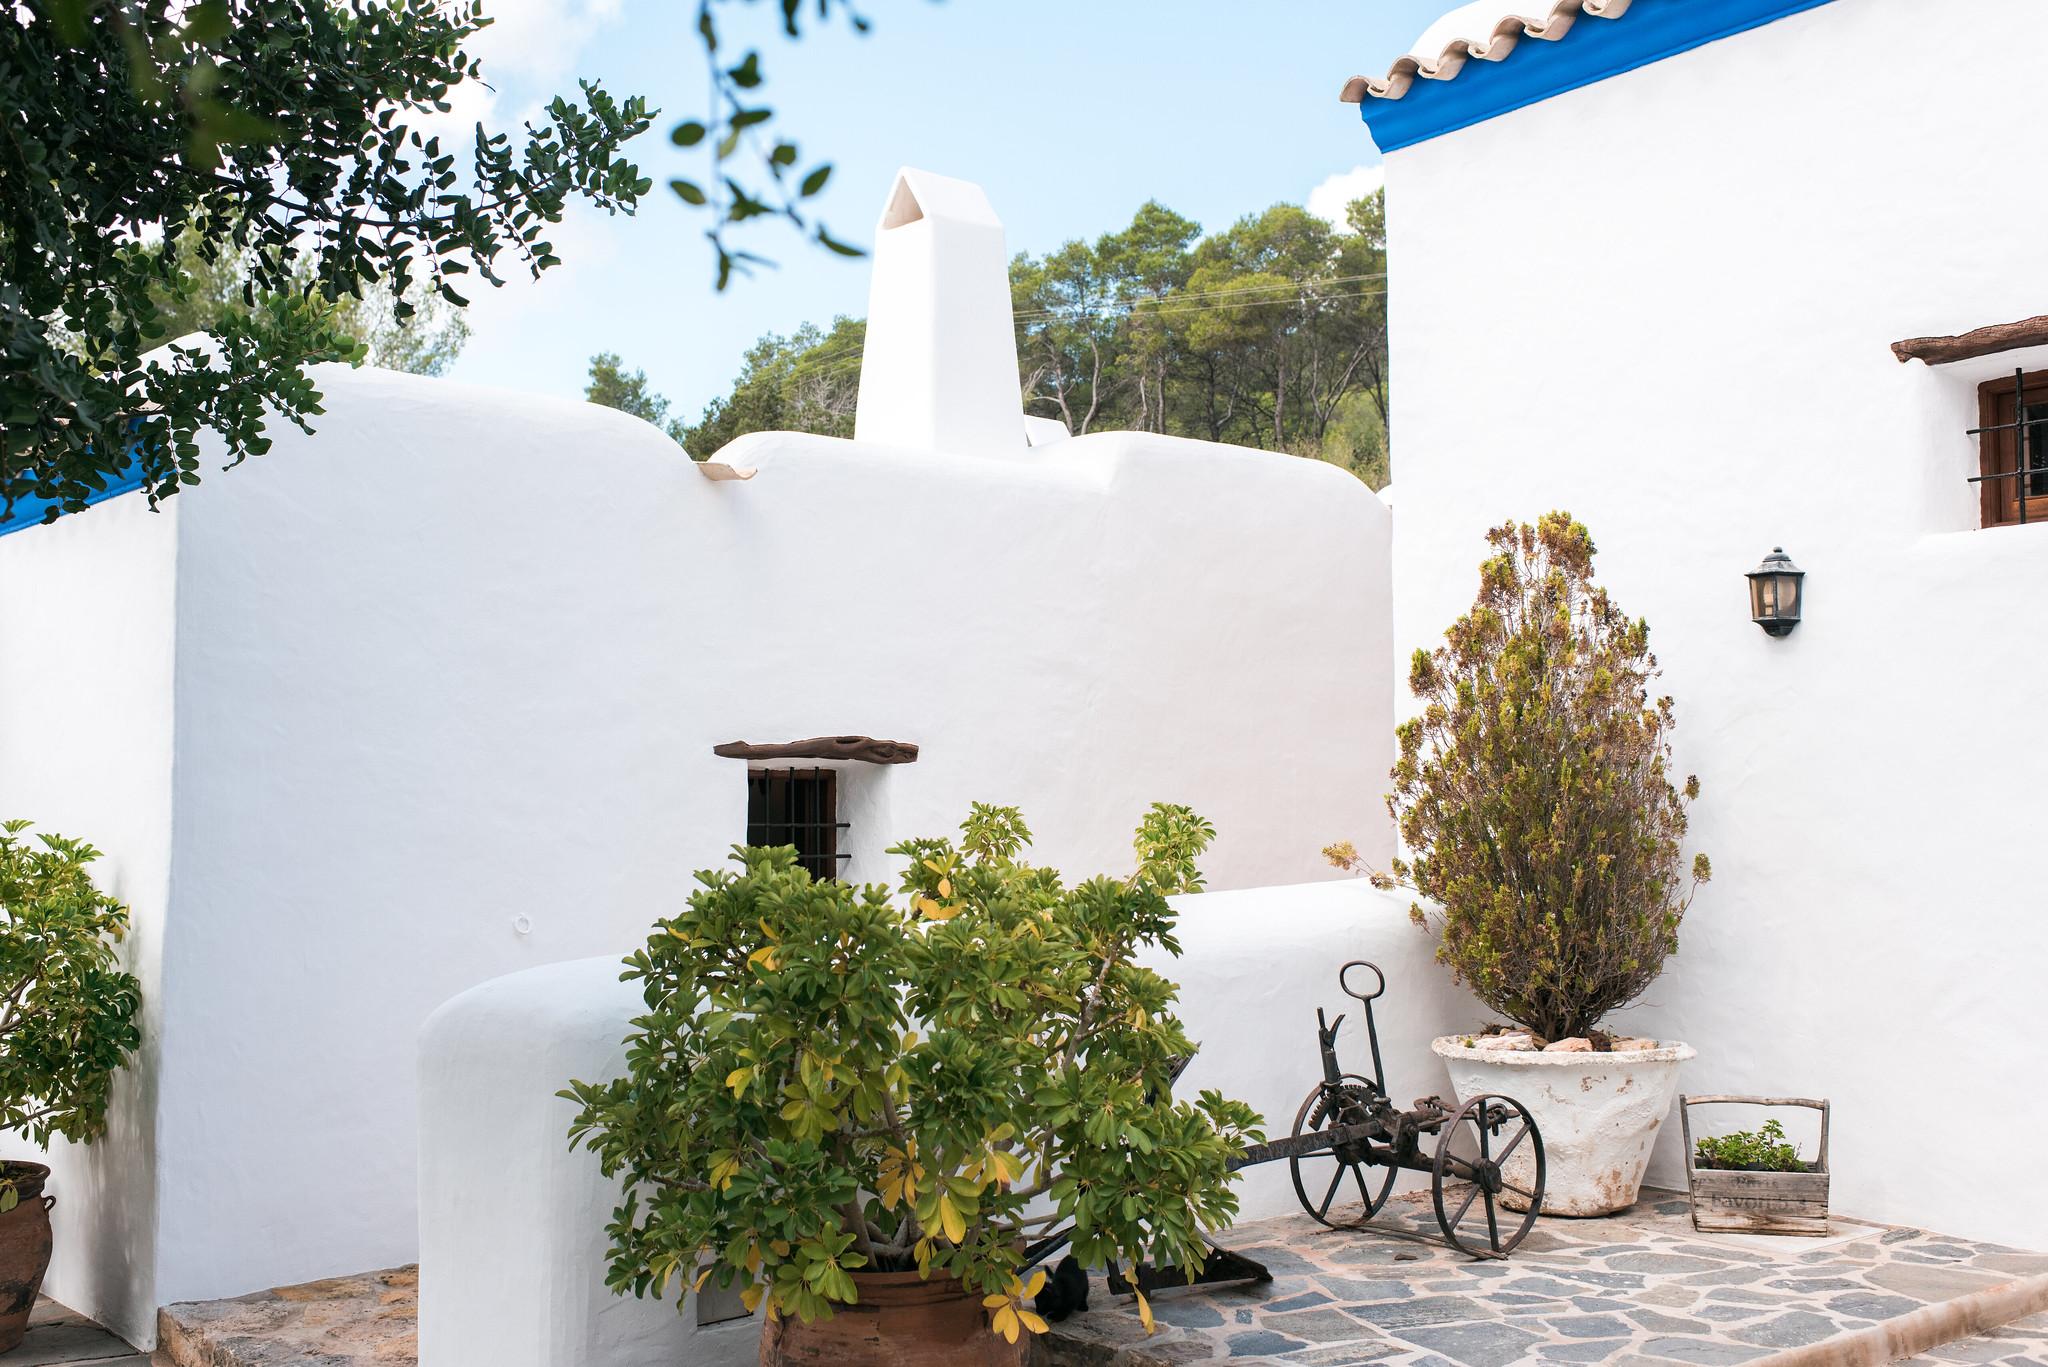 https://www.white-ibiza.com/wp-content/uploads/2020/05/white-ibiza-villas-canblay-courtyard.jpg